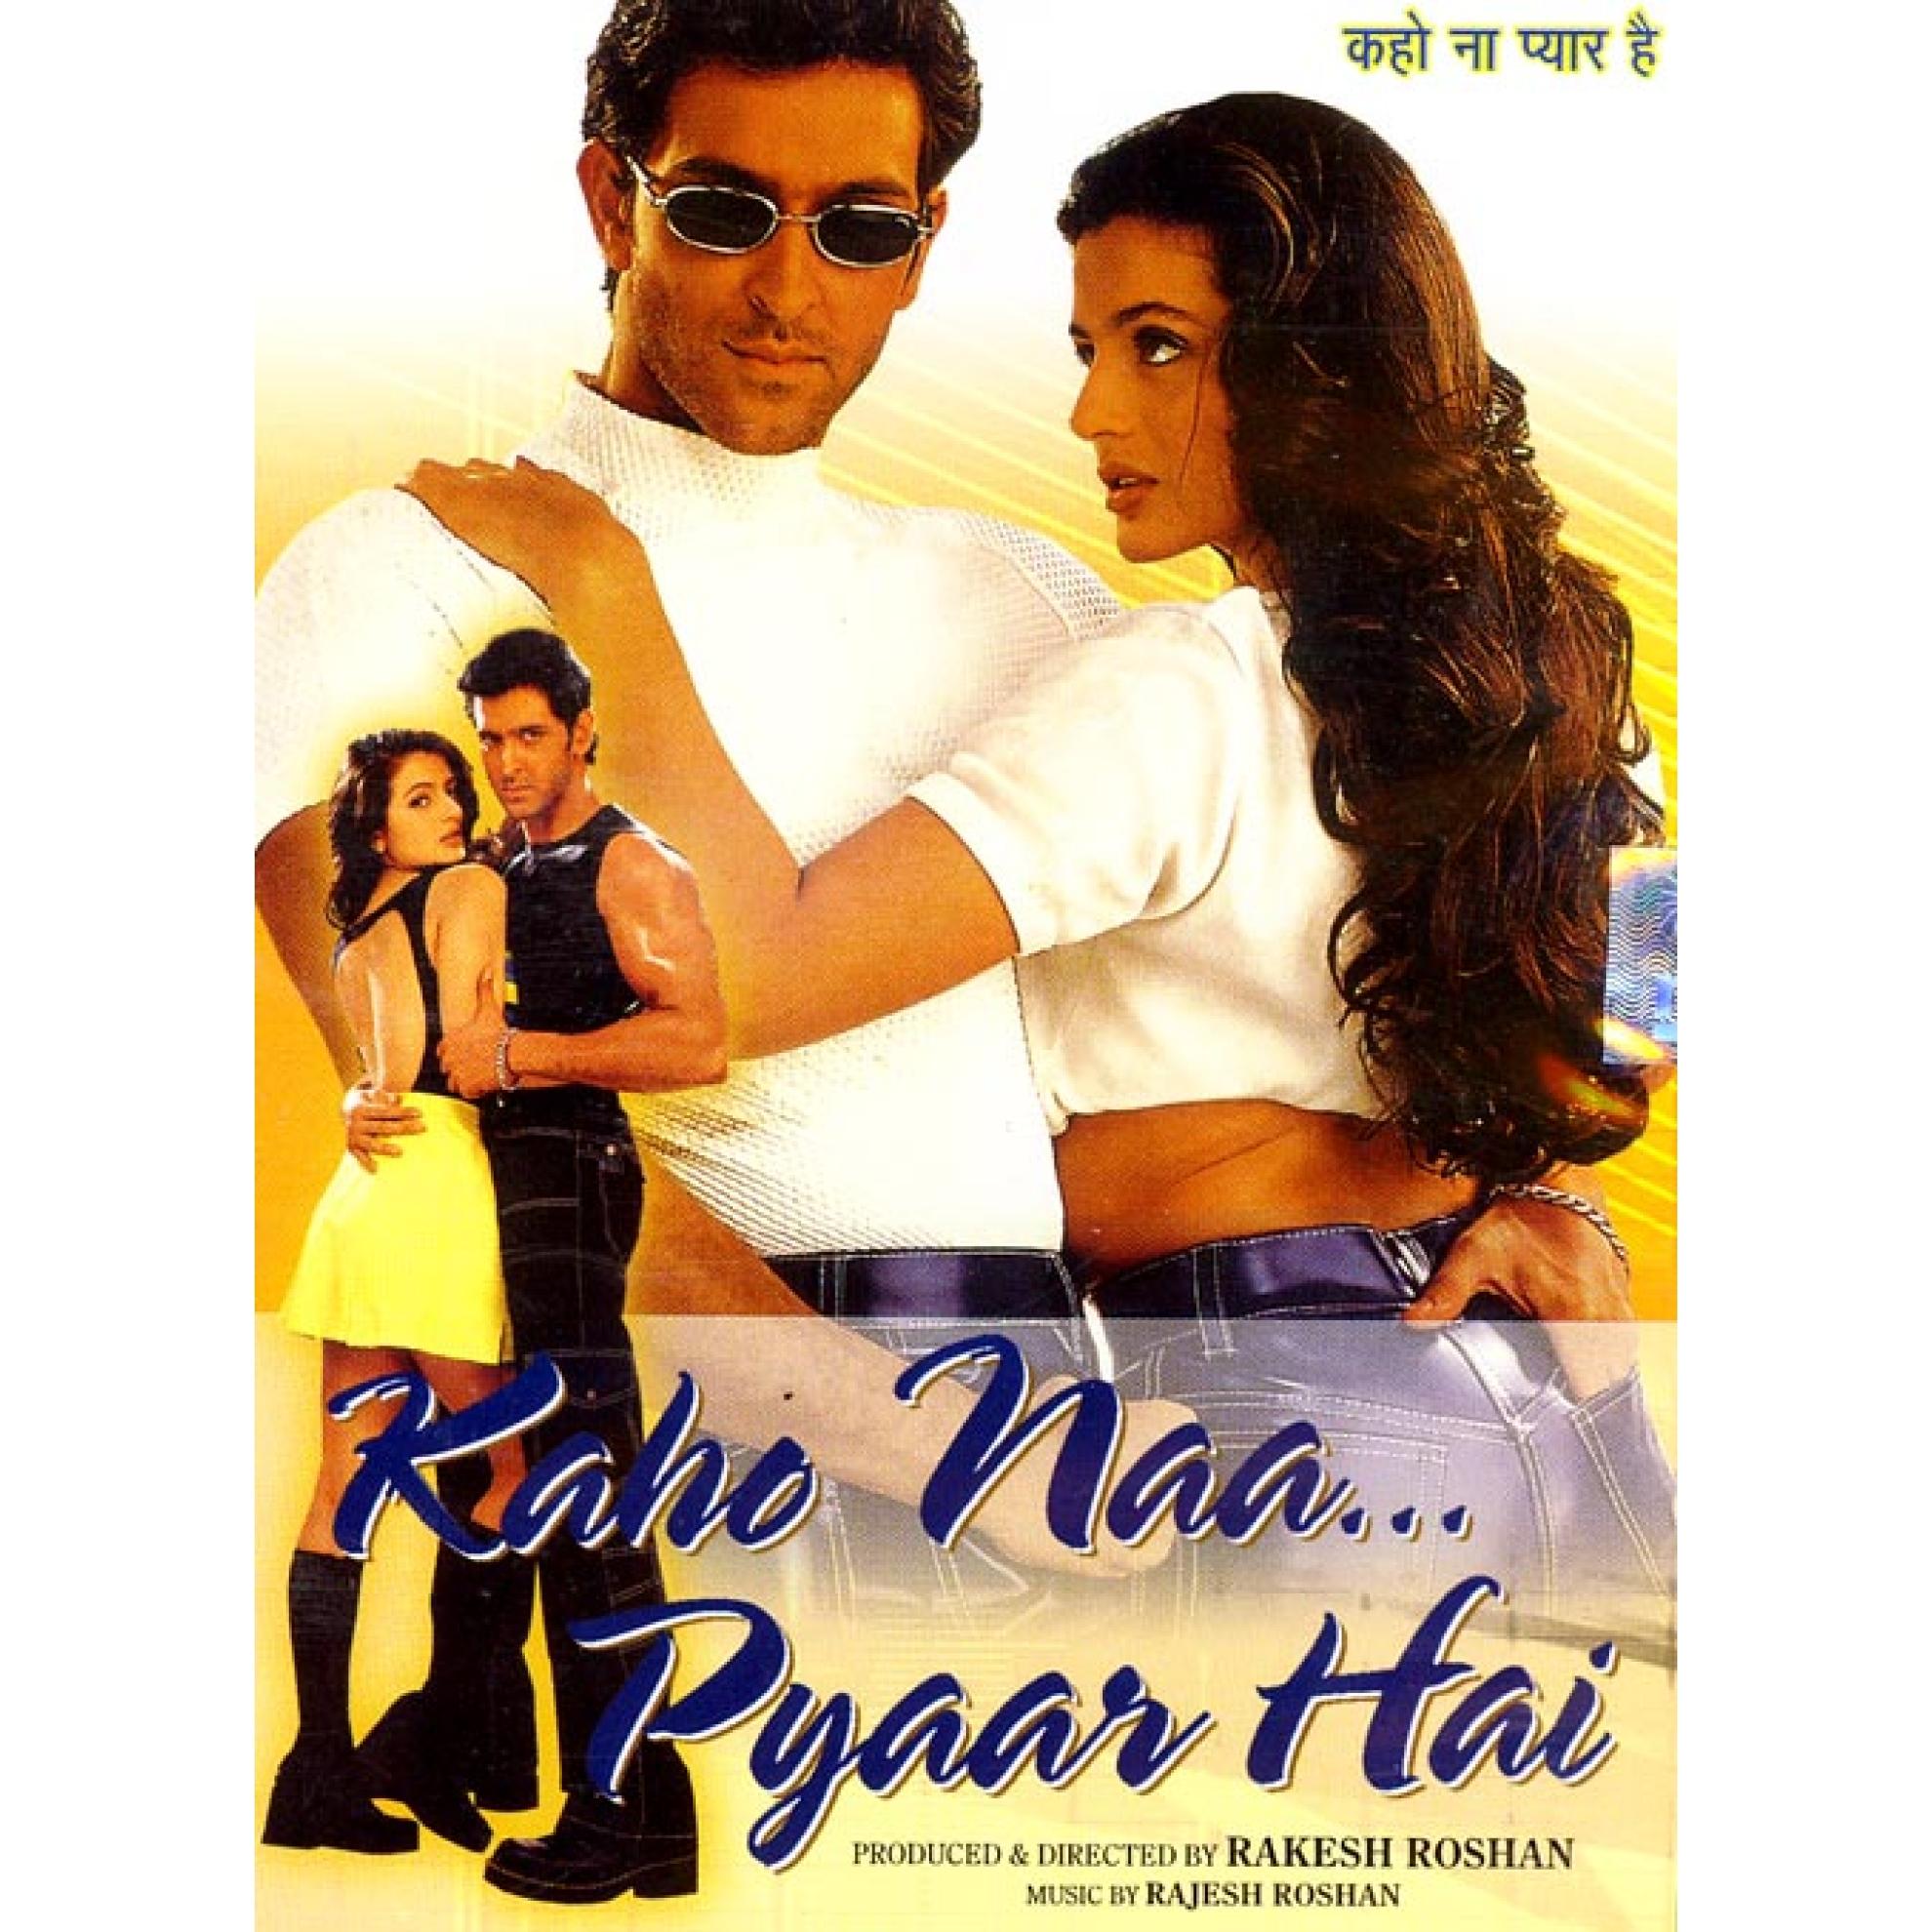 Bepanah Pyaar Hai Tumse Song Download: Soundtrack Kahona Pyar Hai